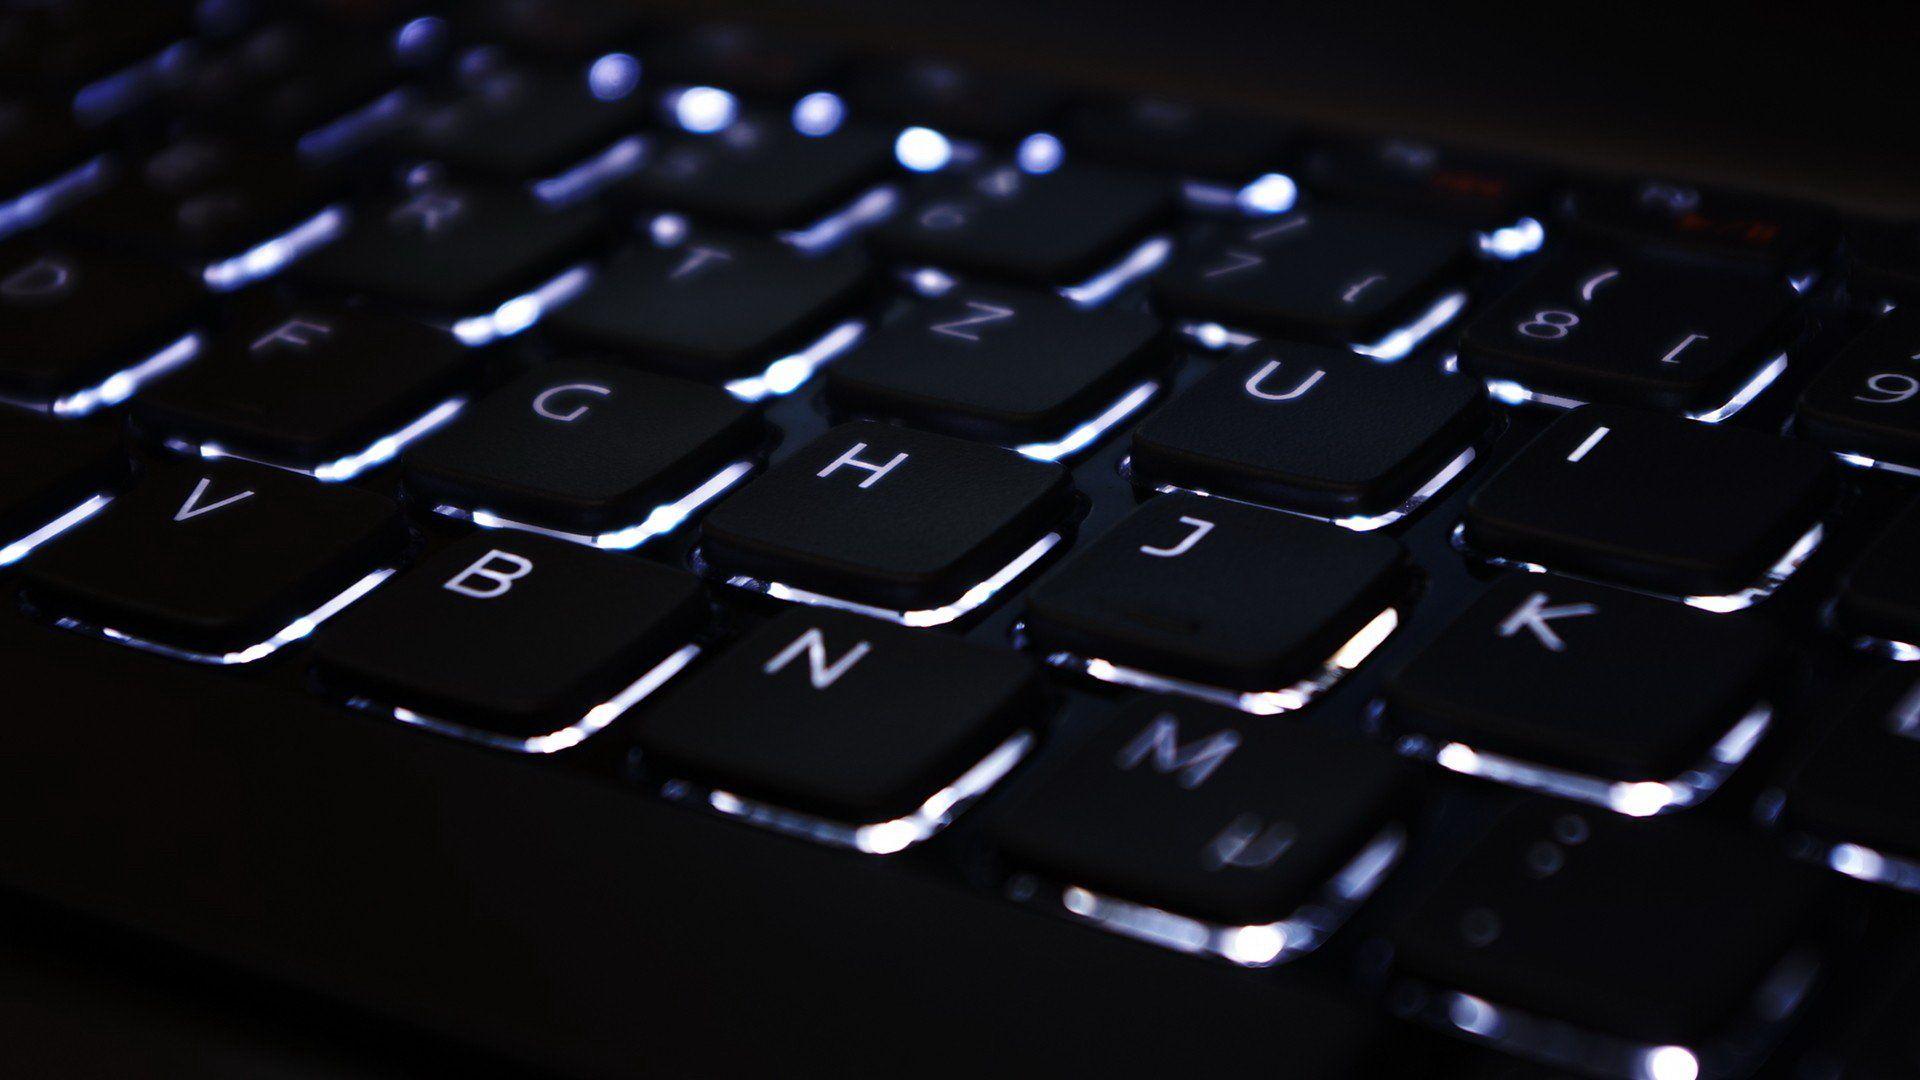 Full HD Keyboard Wallpapers   Top Full HD Keyboard 1920x1080